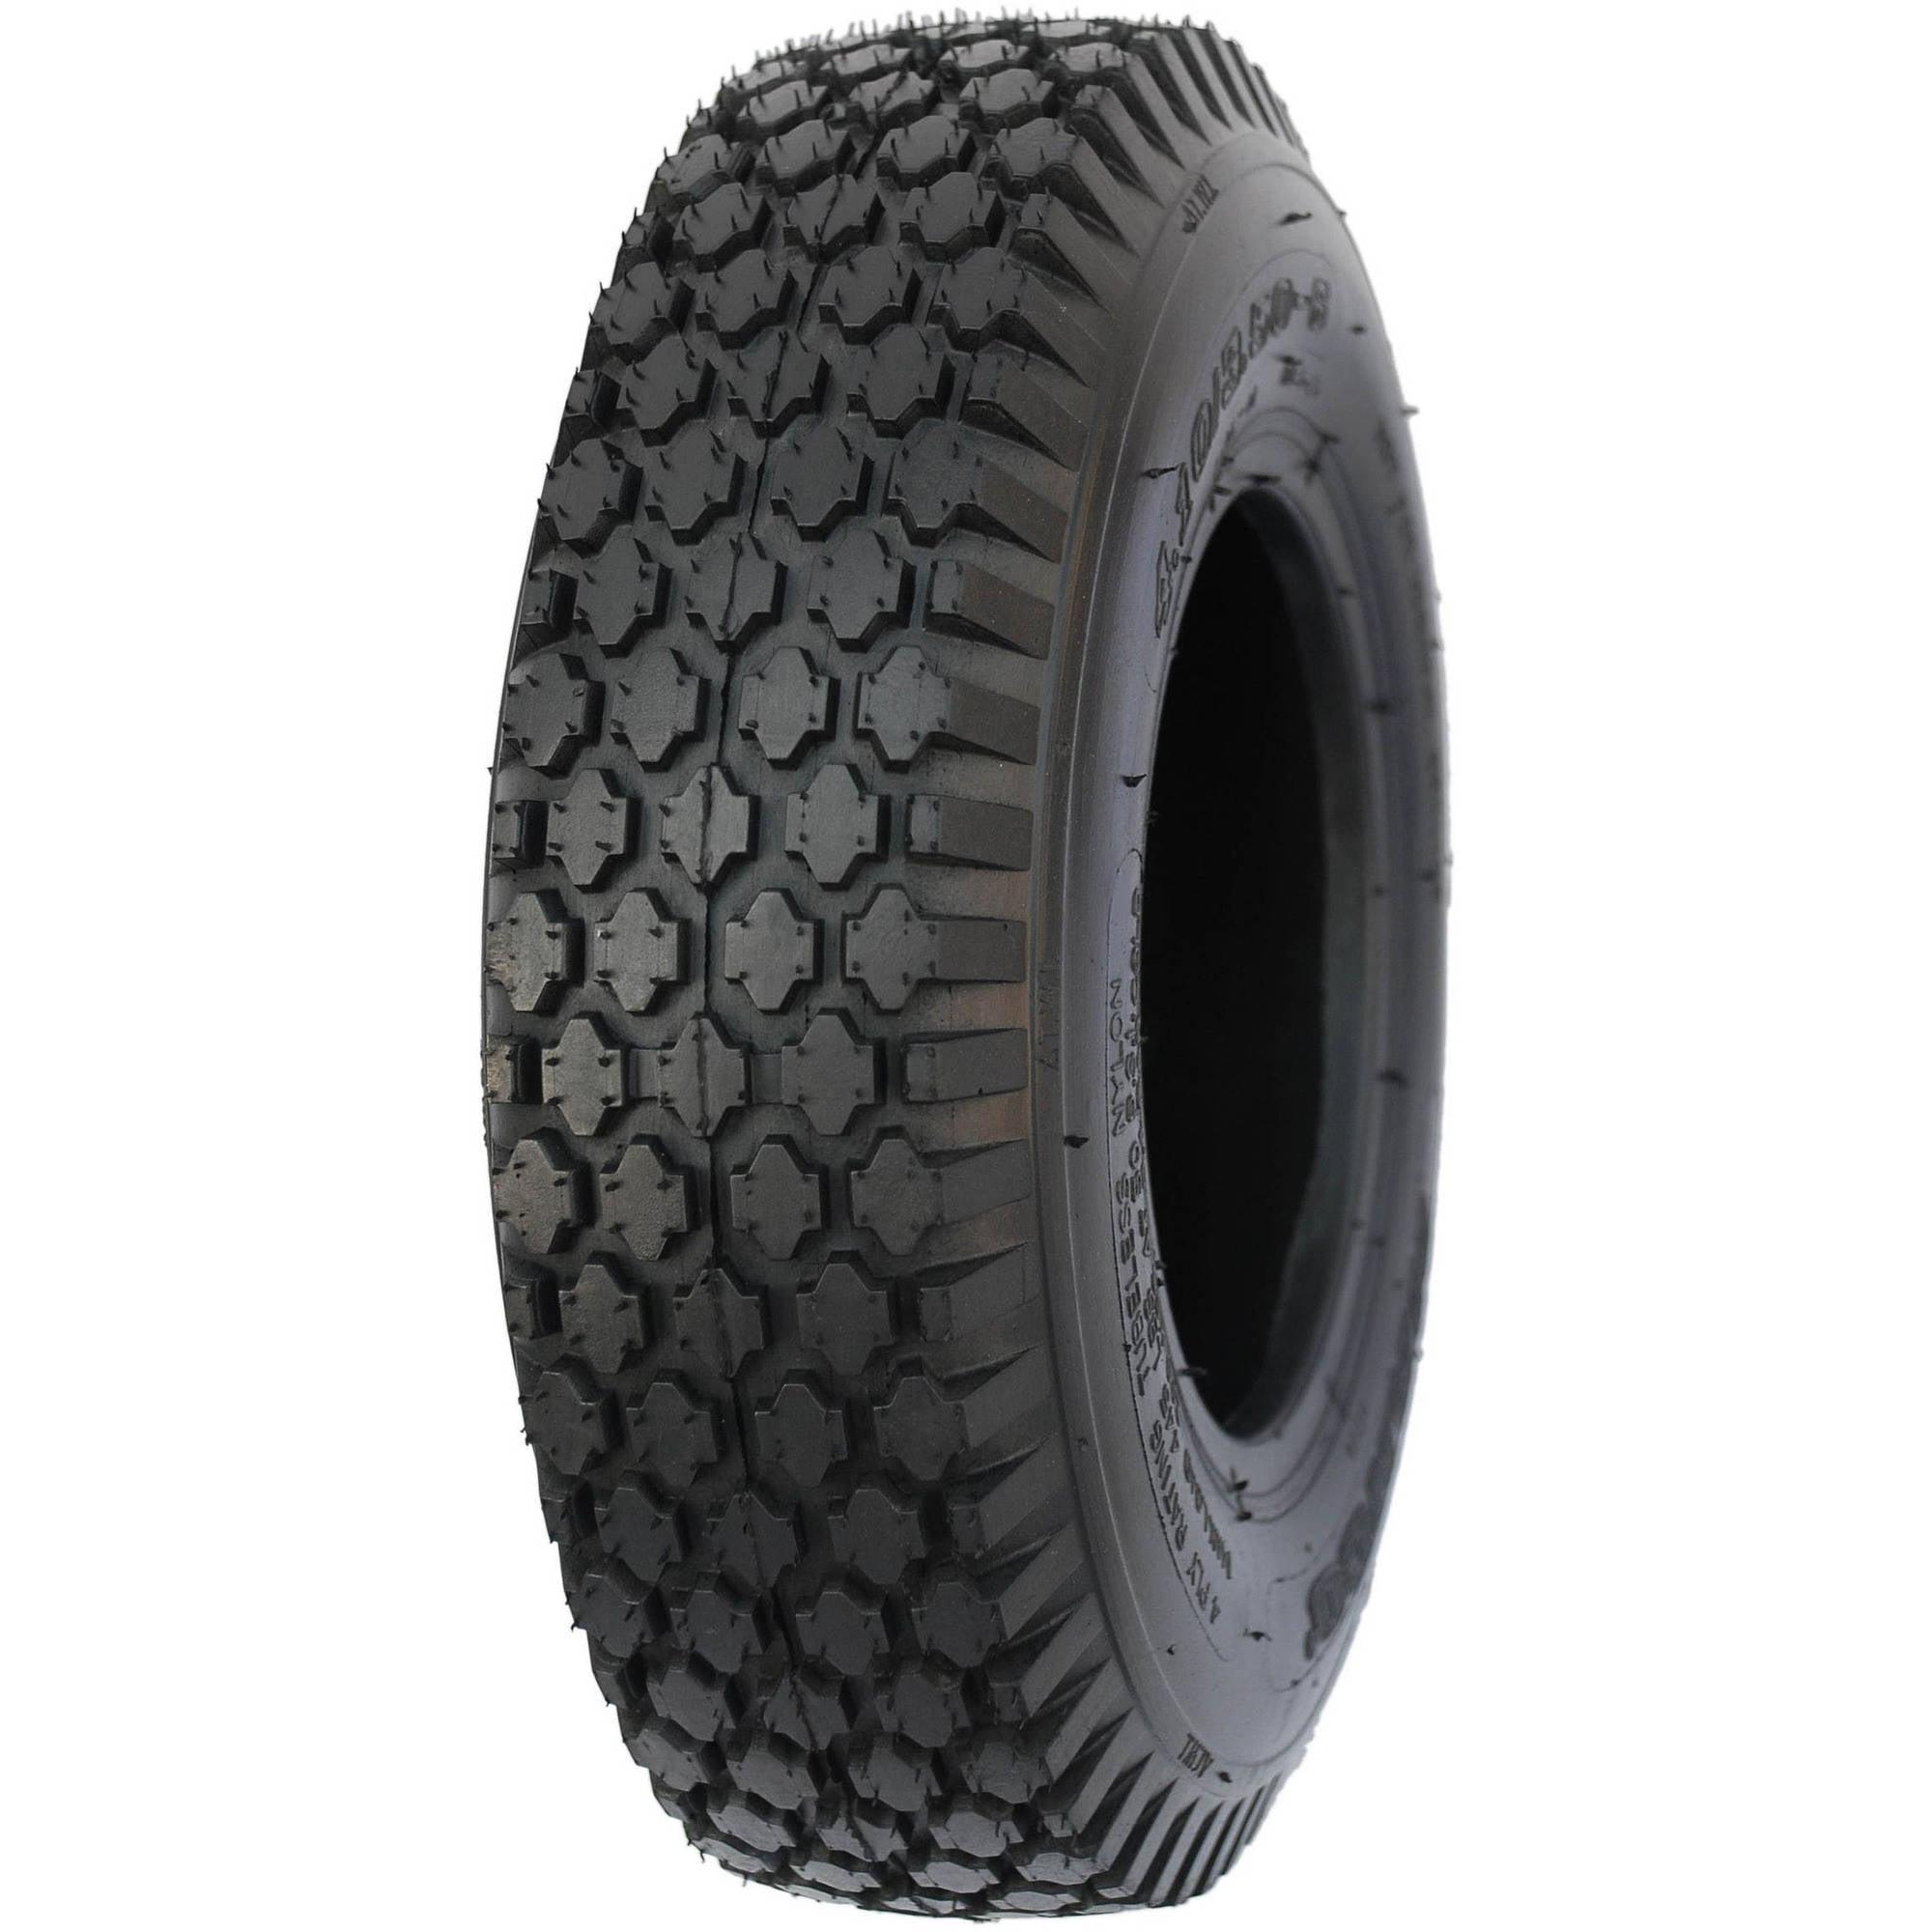 HI-RUN Stud Super Tire 4.10/3.50-5 2PR